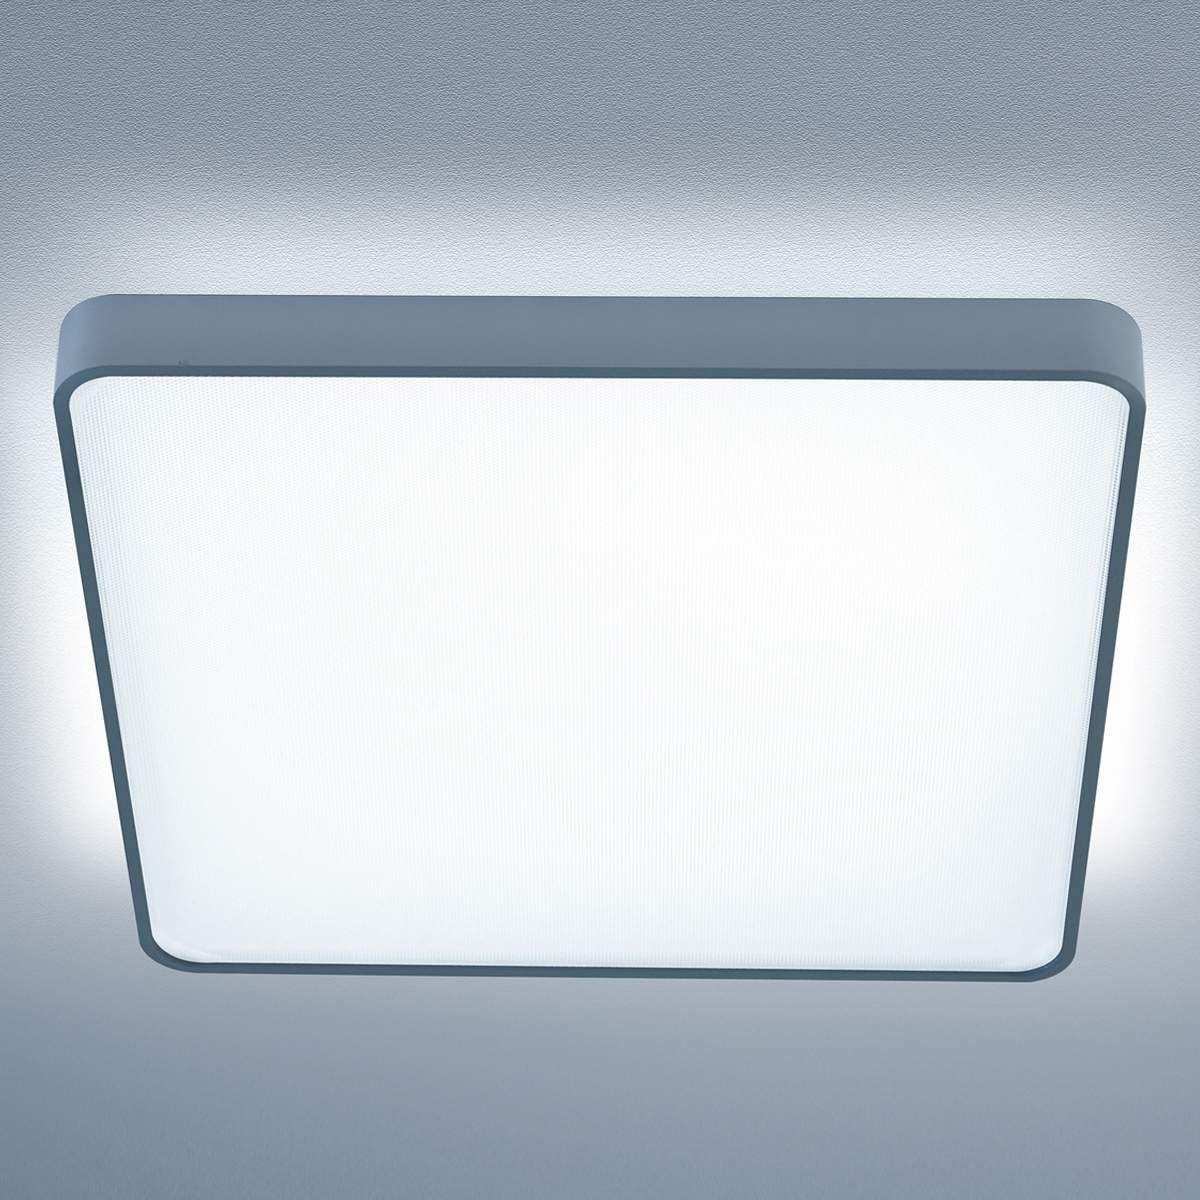 lampen deckenhalterung